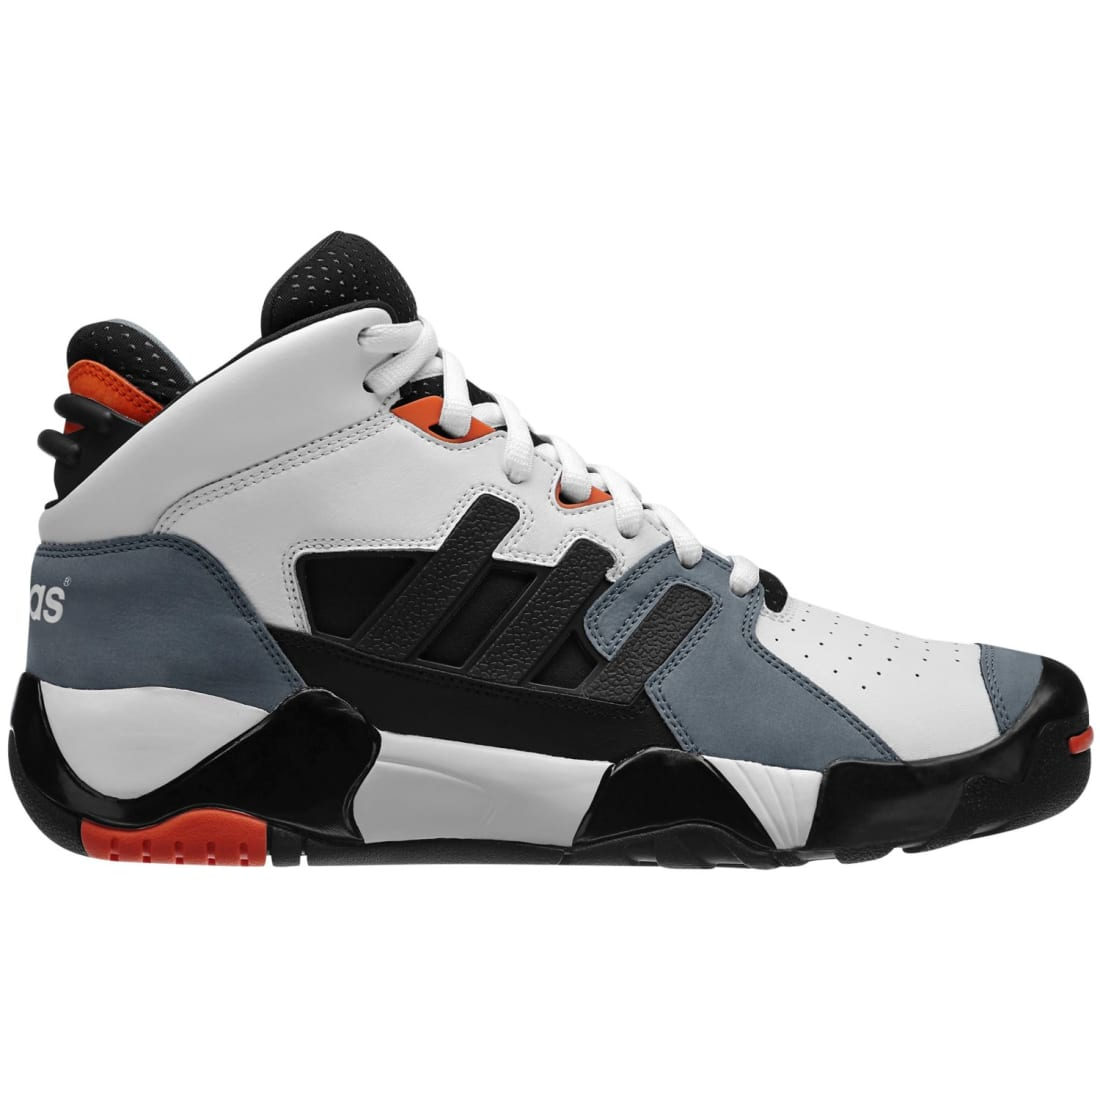 adidas Streetball 2 | Adidas | Sole Collector